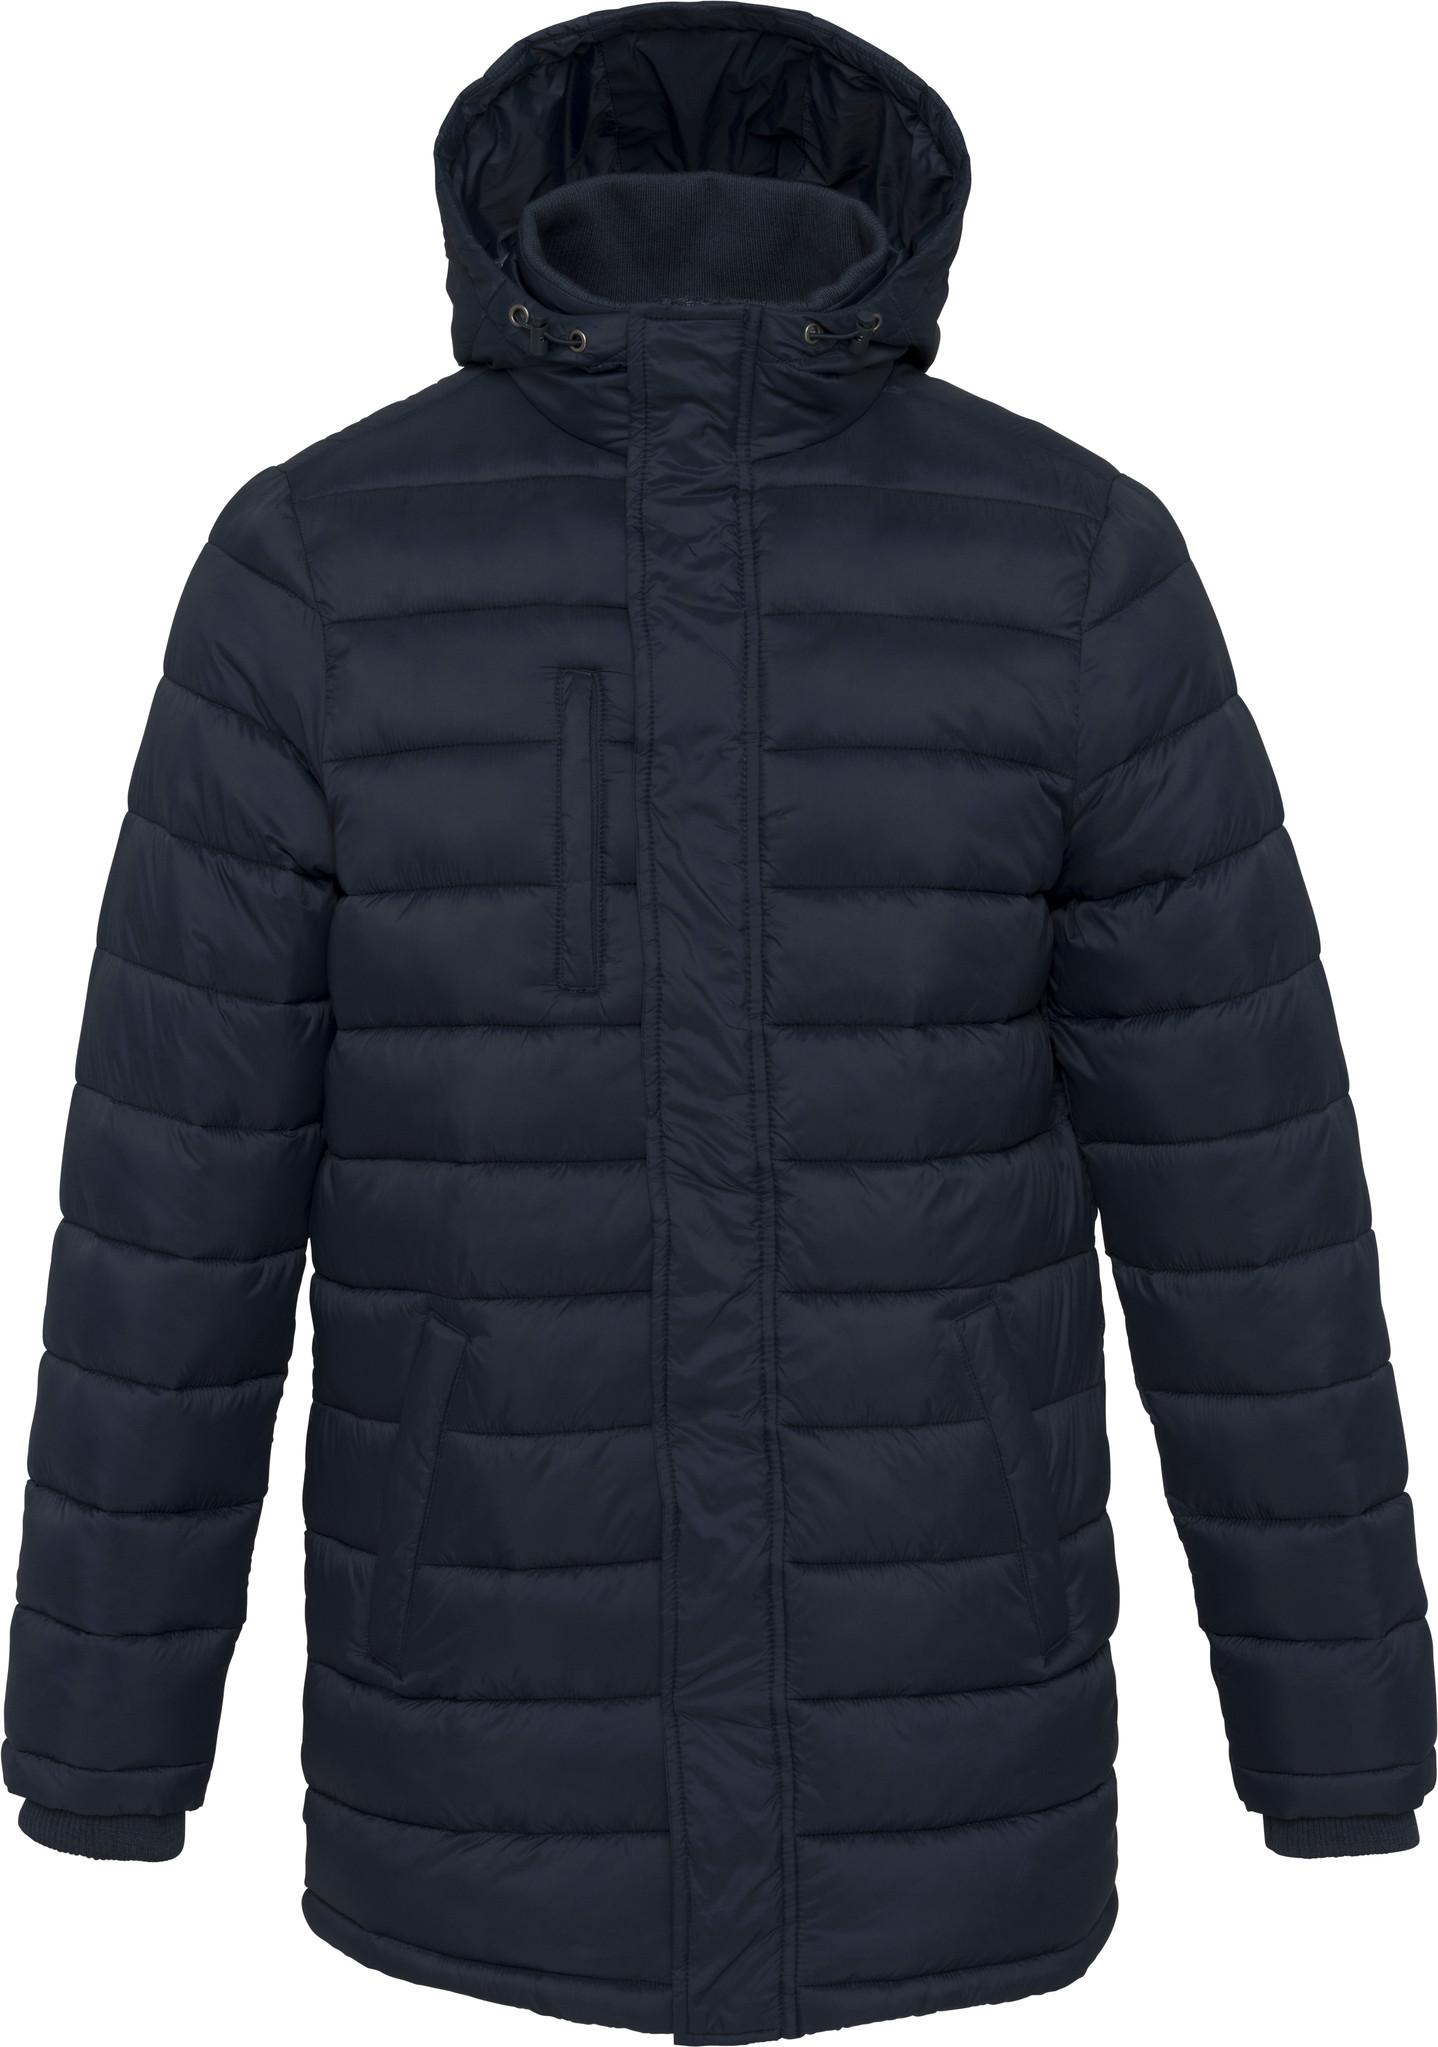 Kariban Kariban long jacket with hoodie - men